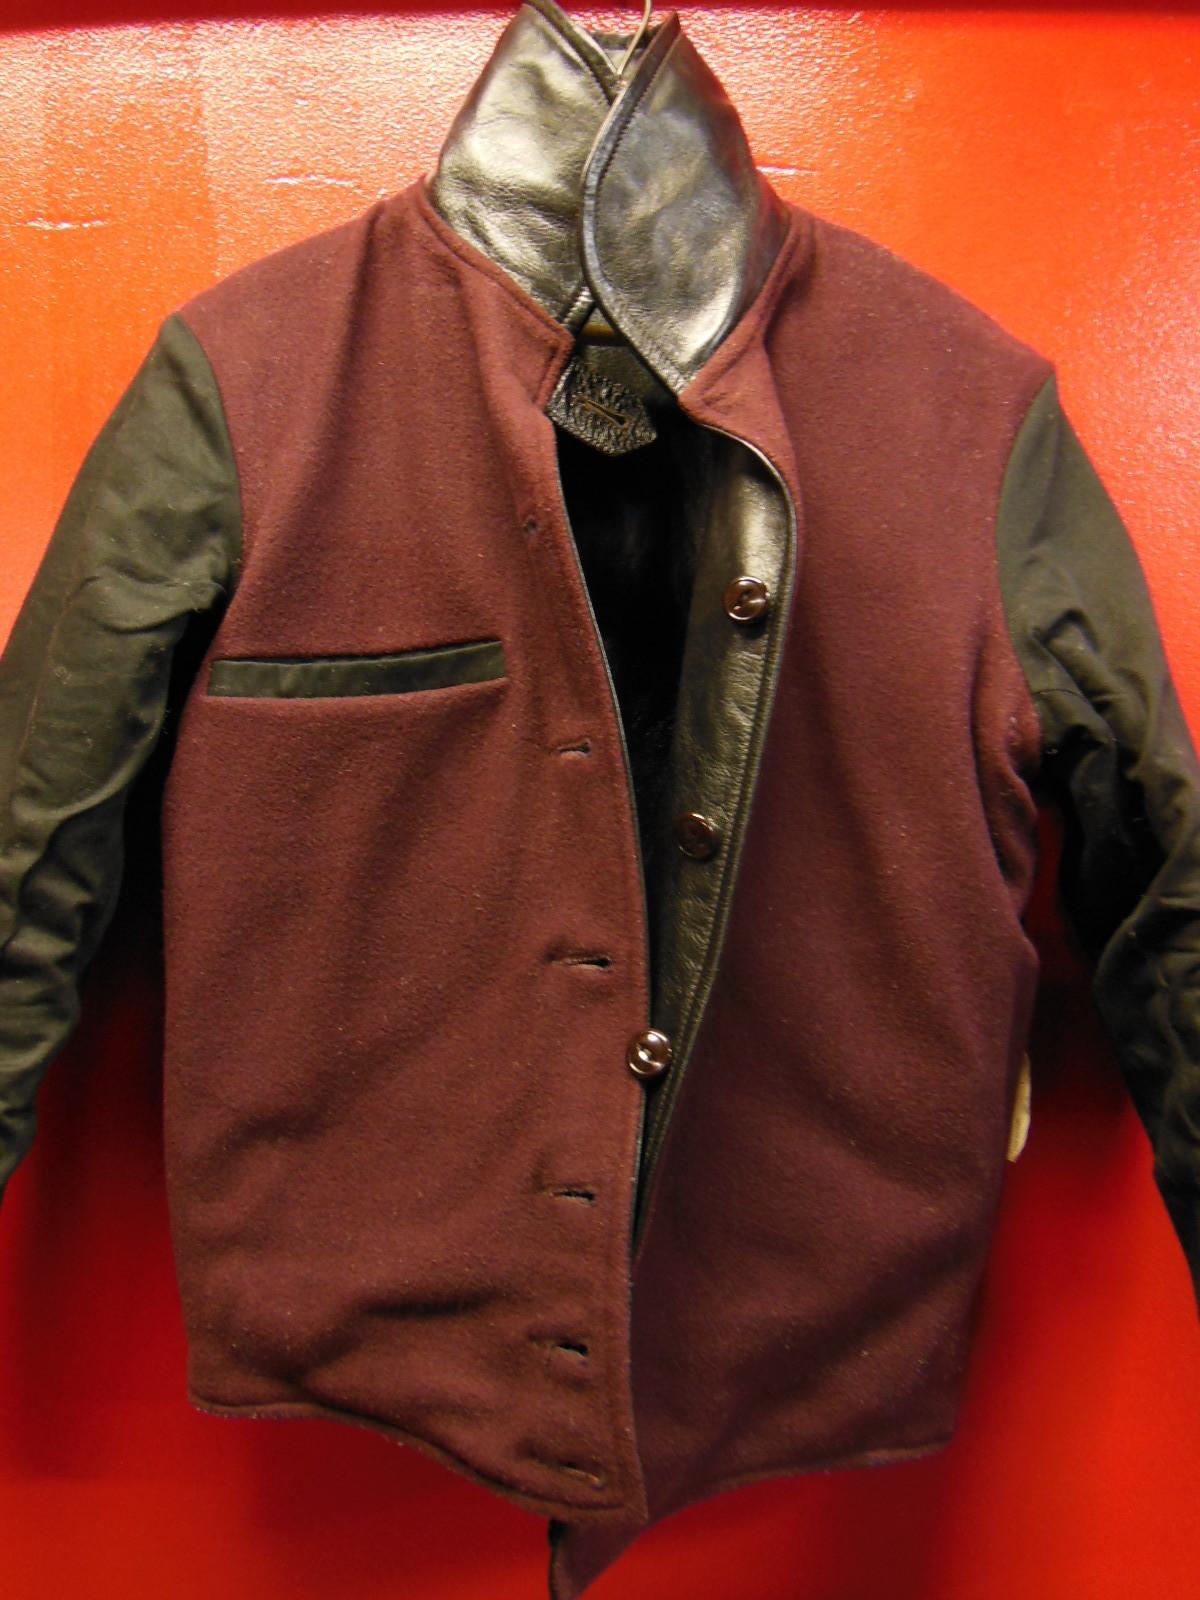 USED HIMEL BROTHERS LEATHER HERON 1929/新喜皮革製黒ホースハイド/SIZE-36/ボタンフロント A-1 ジャケット_c0187684_15065286.jpg